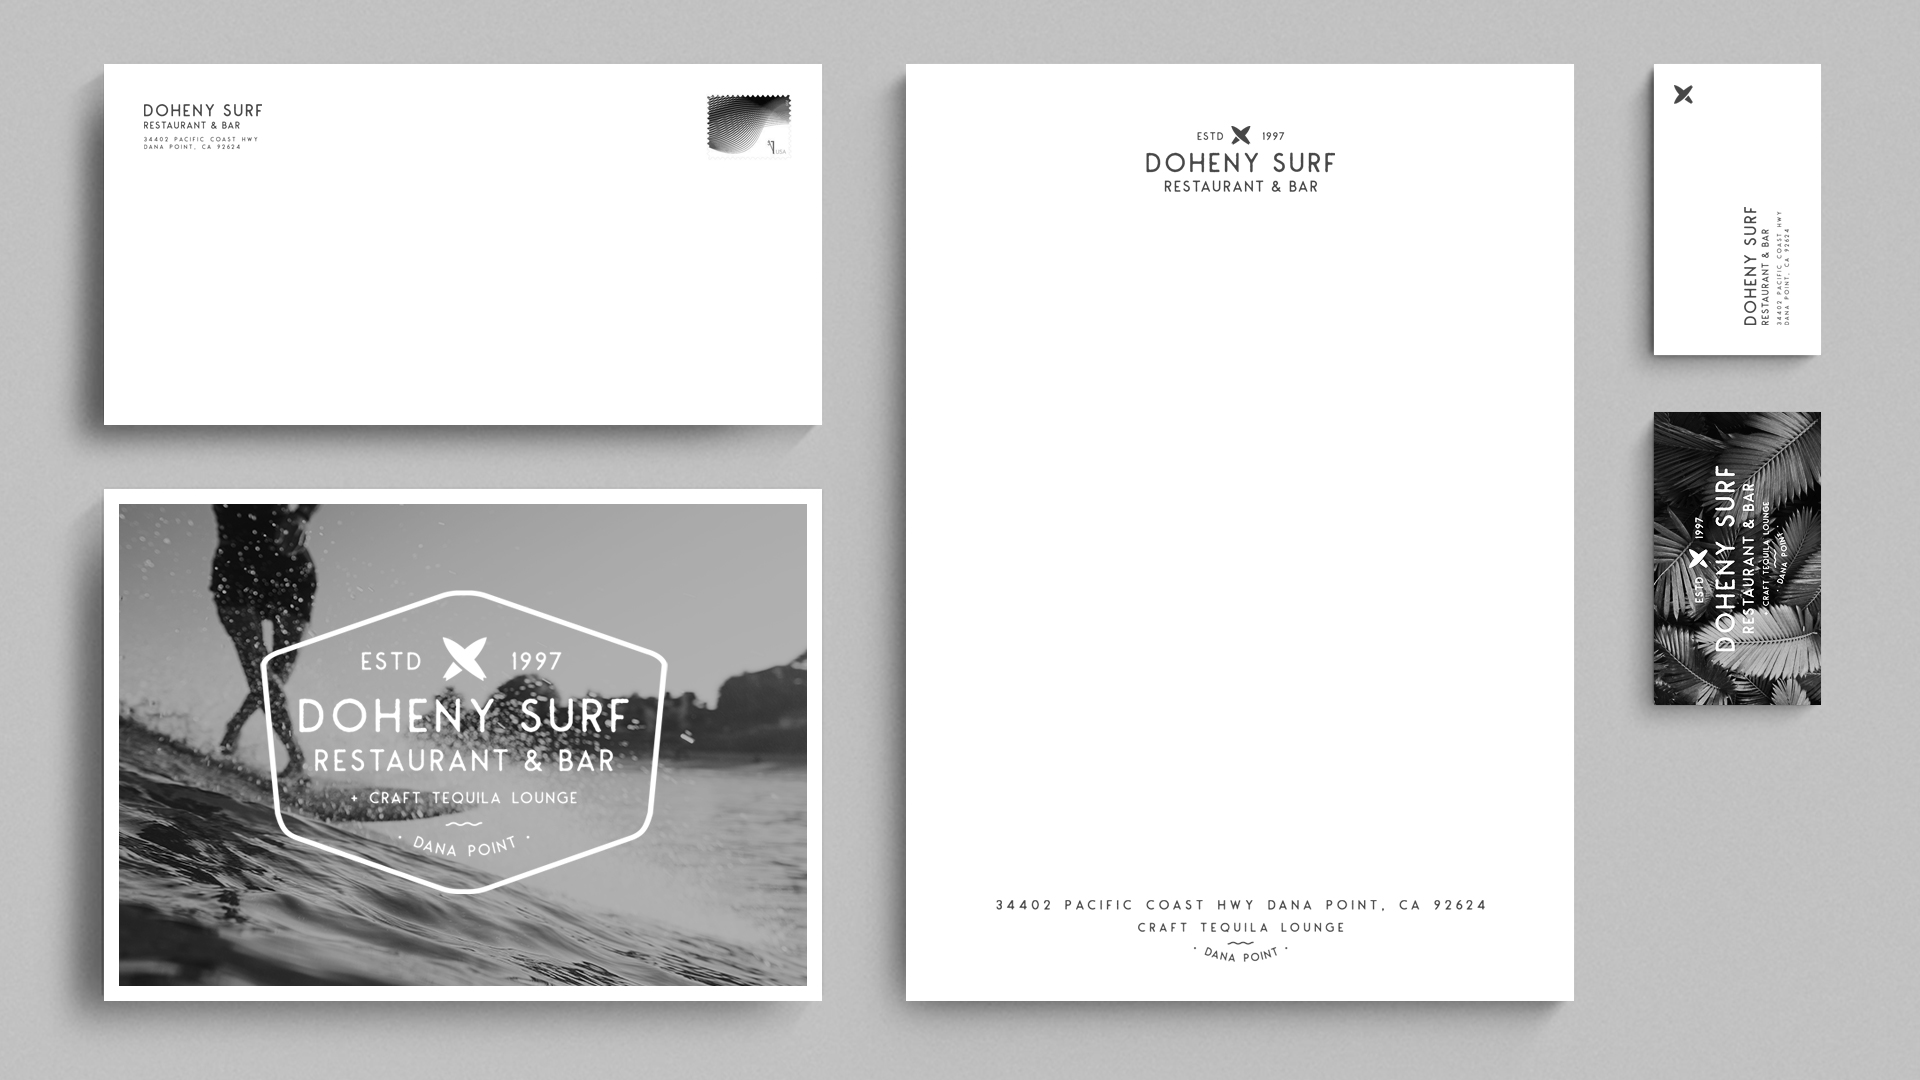 Doheny Surf Restaurant Doubletree Hotel Dana Point Stationery - Unsung Studio Branding